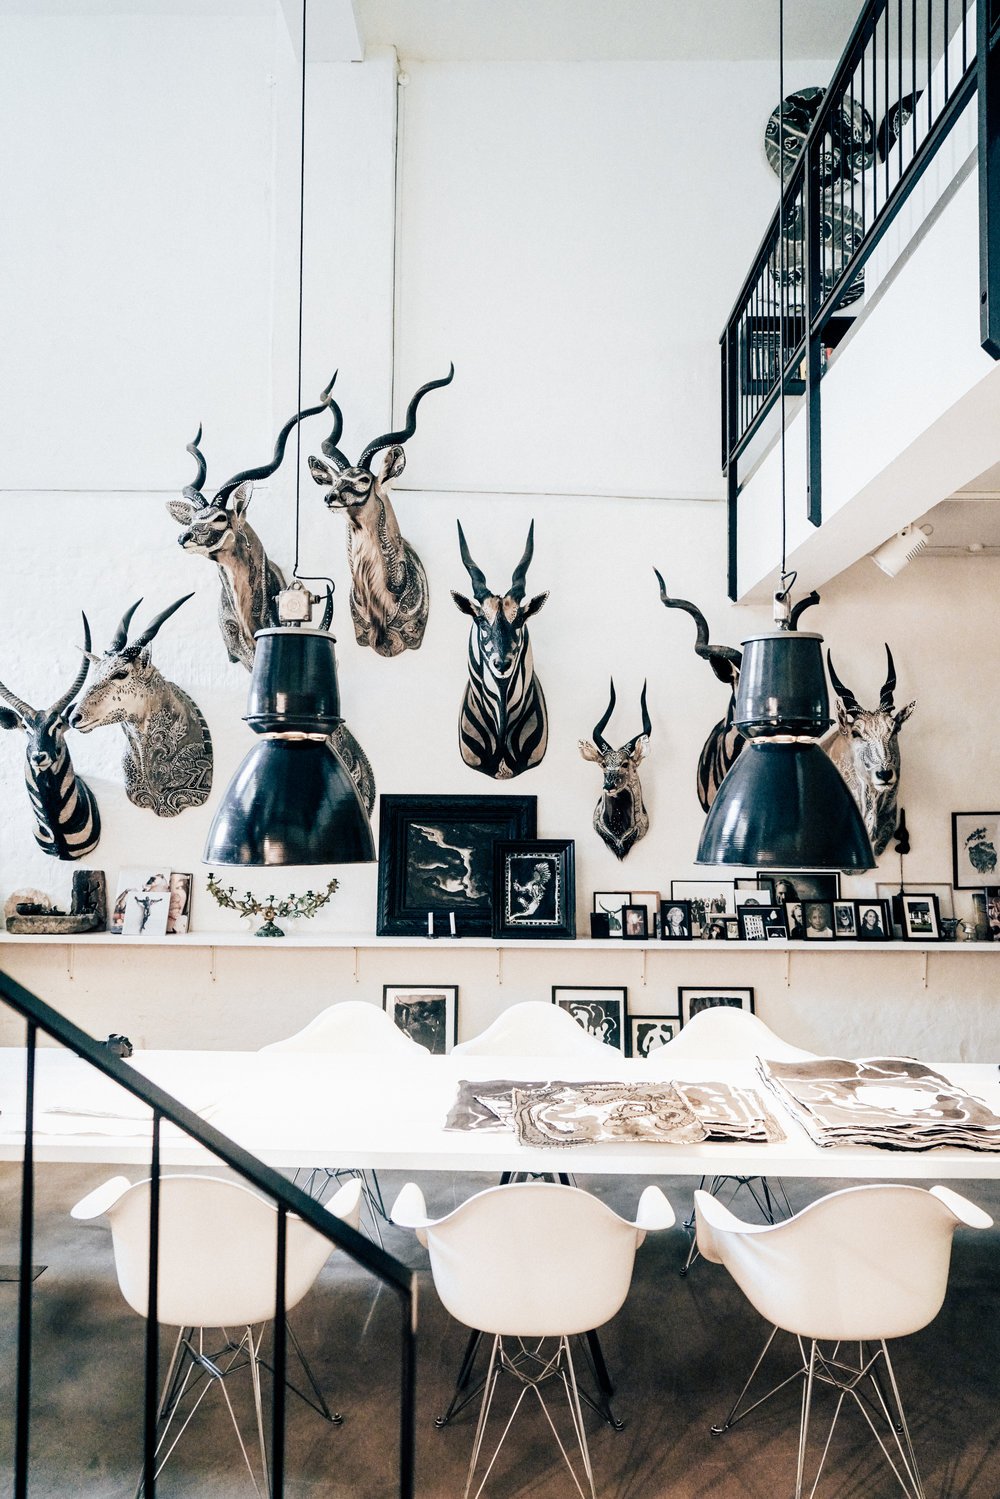 Morten Angelo's dining area